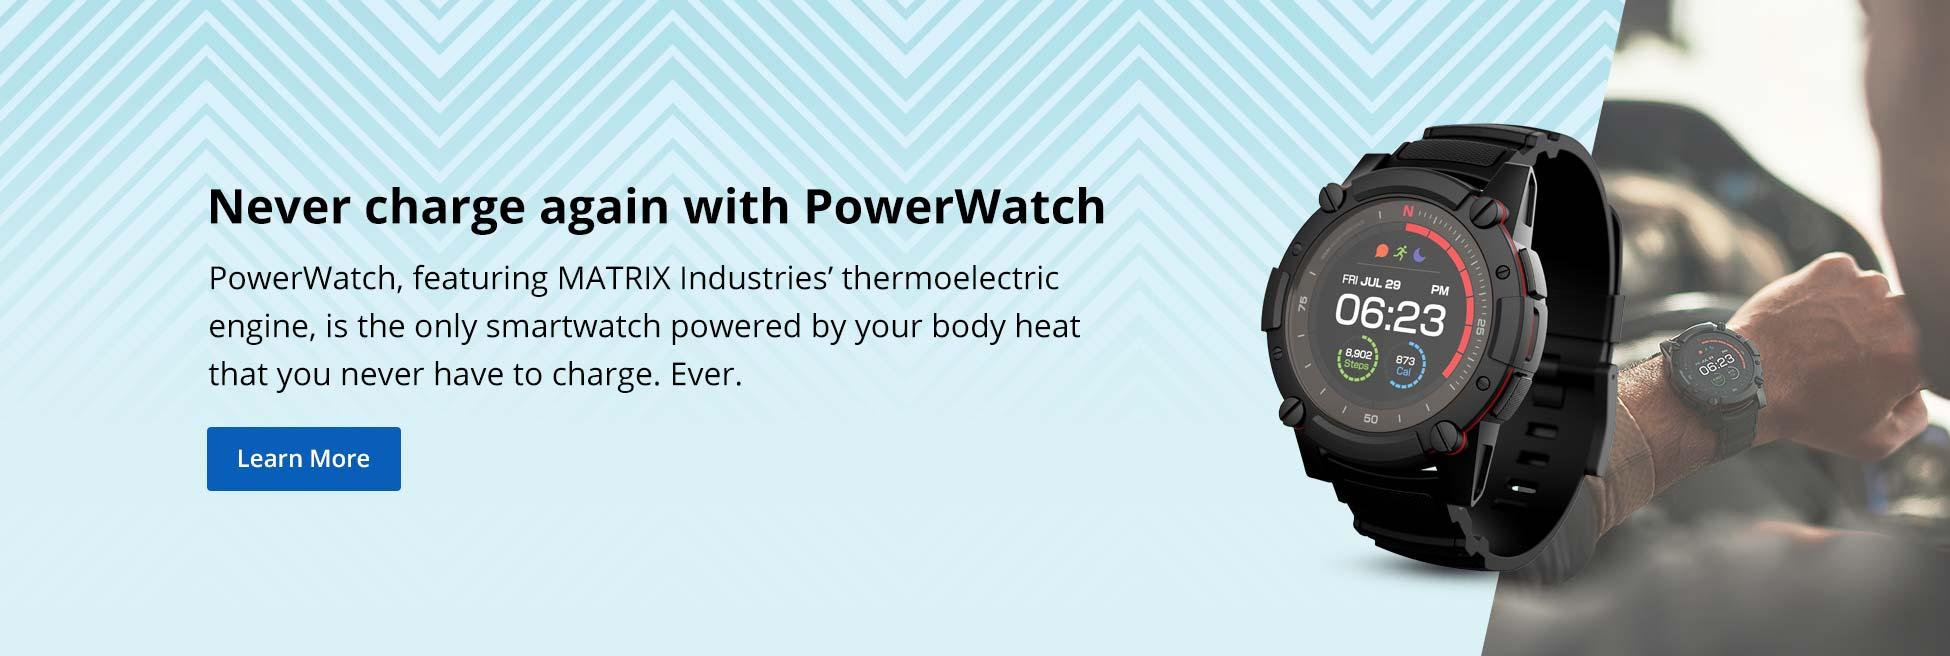 7fcd07d84 Smartwatch | Best Buy Canada